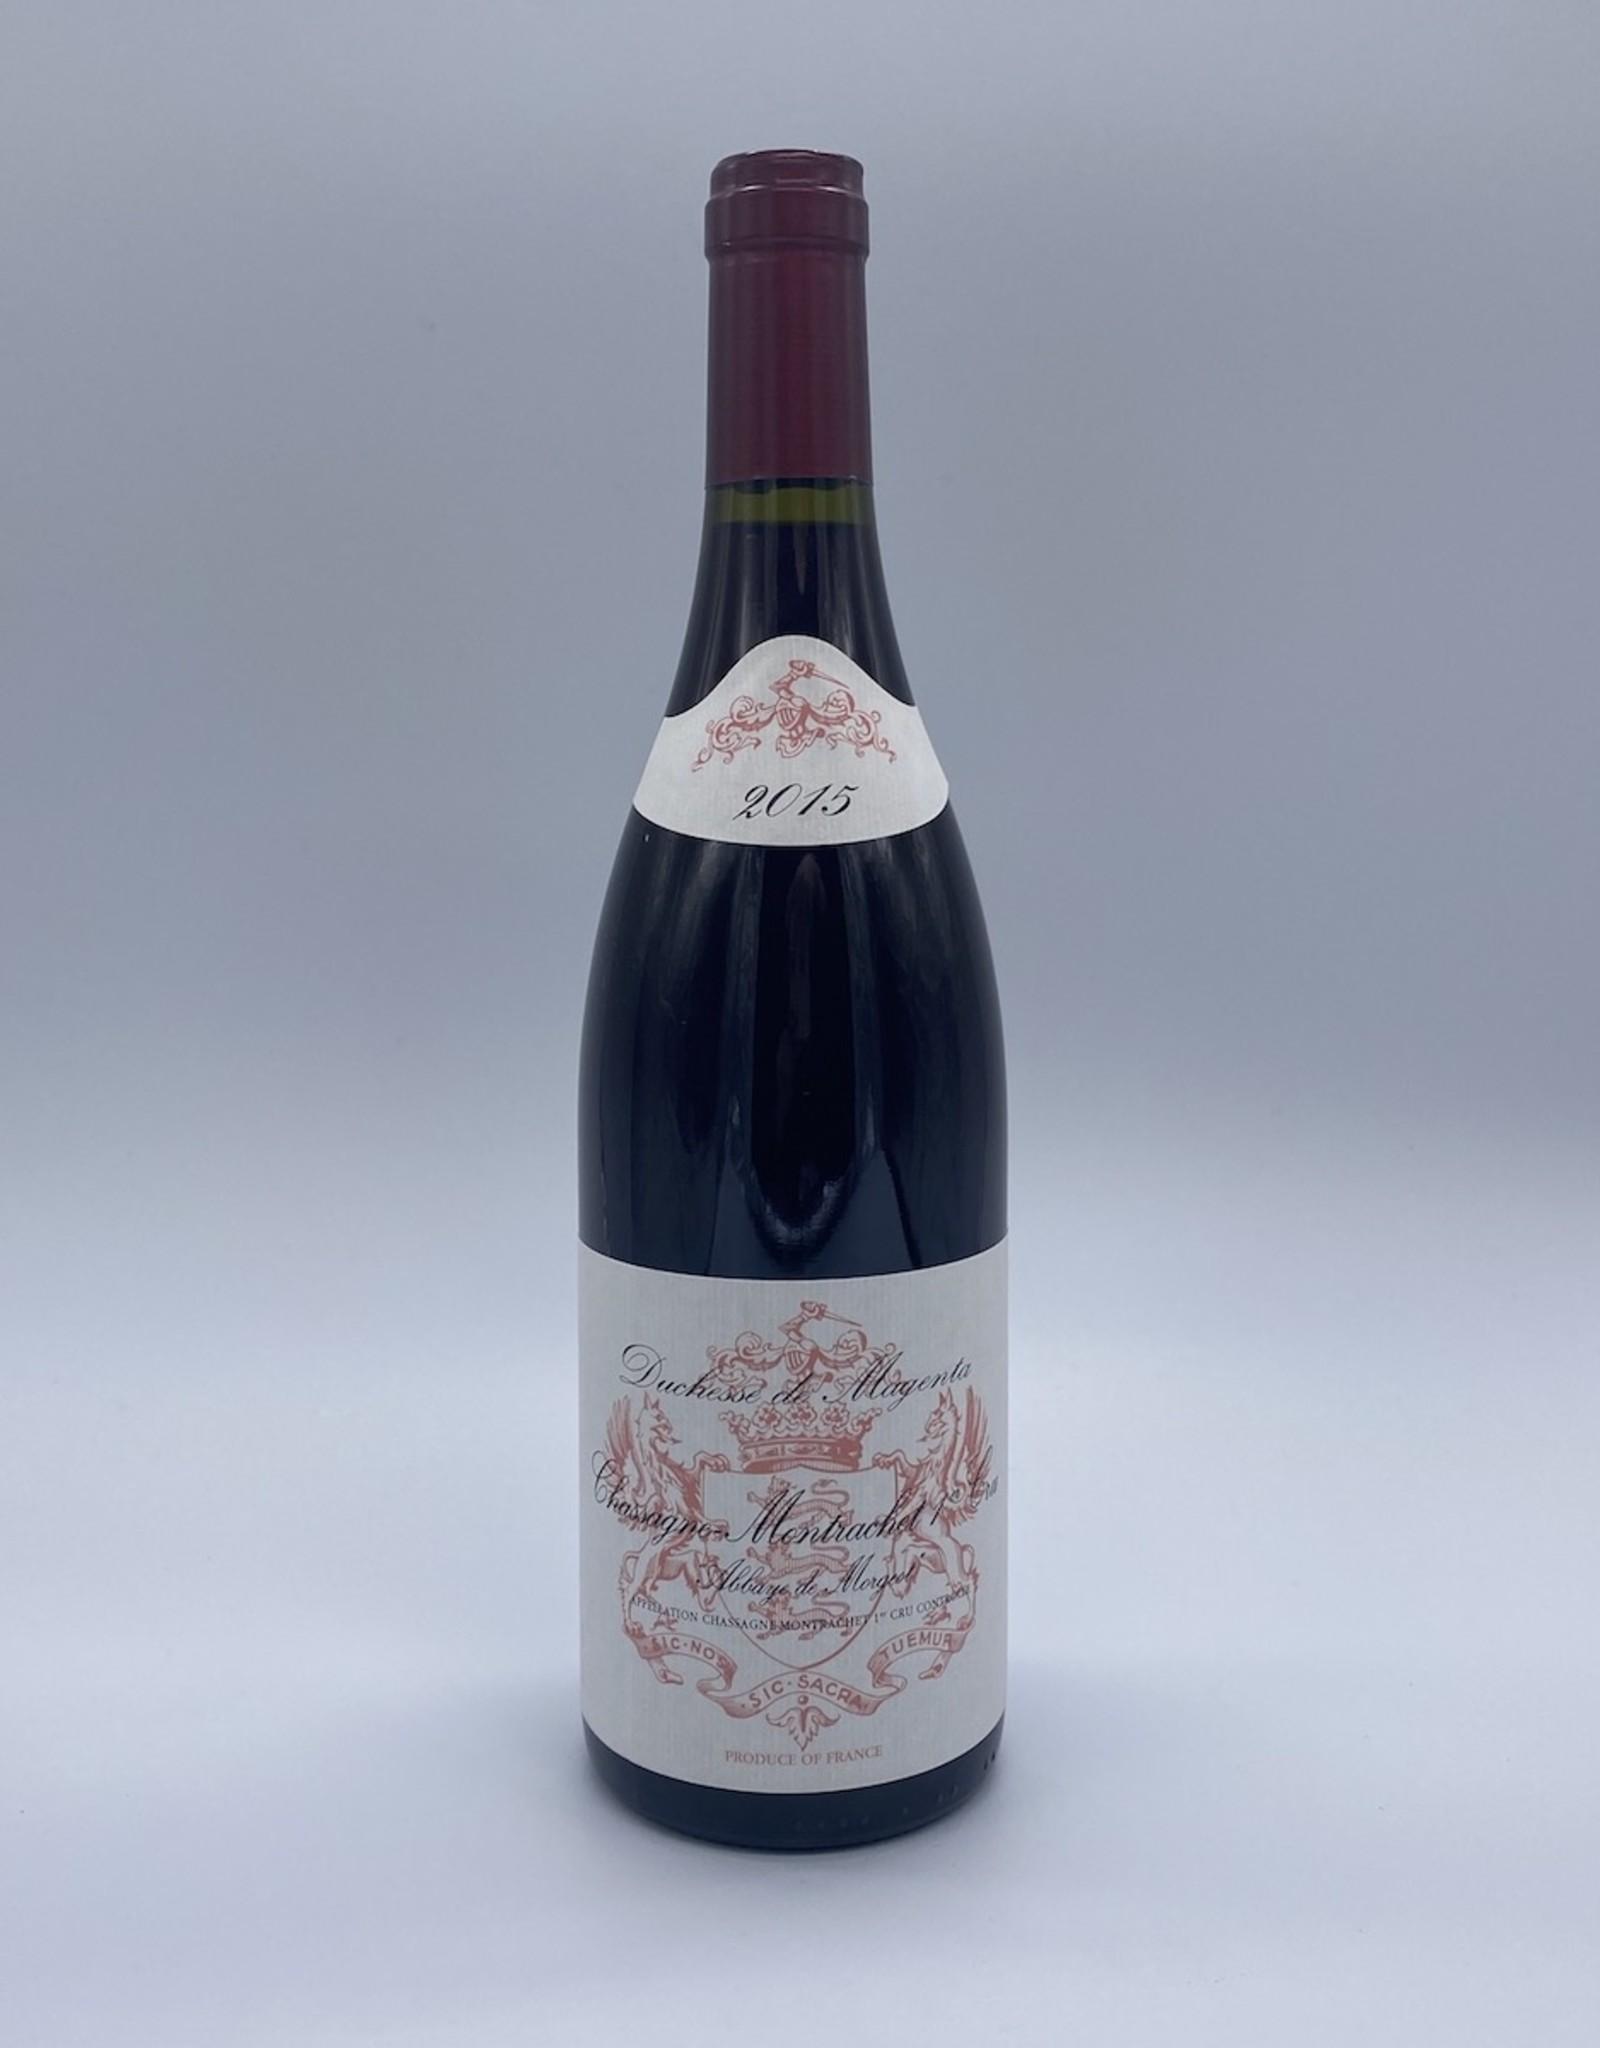 Duchesse de Magenta Bout.vin rouge Chassagne Montrachet 1er cru 2015